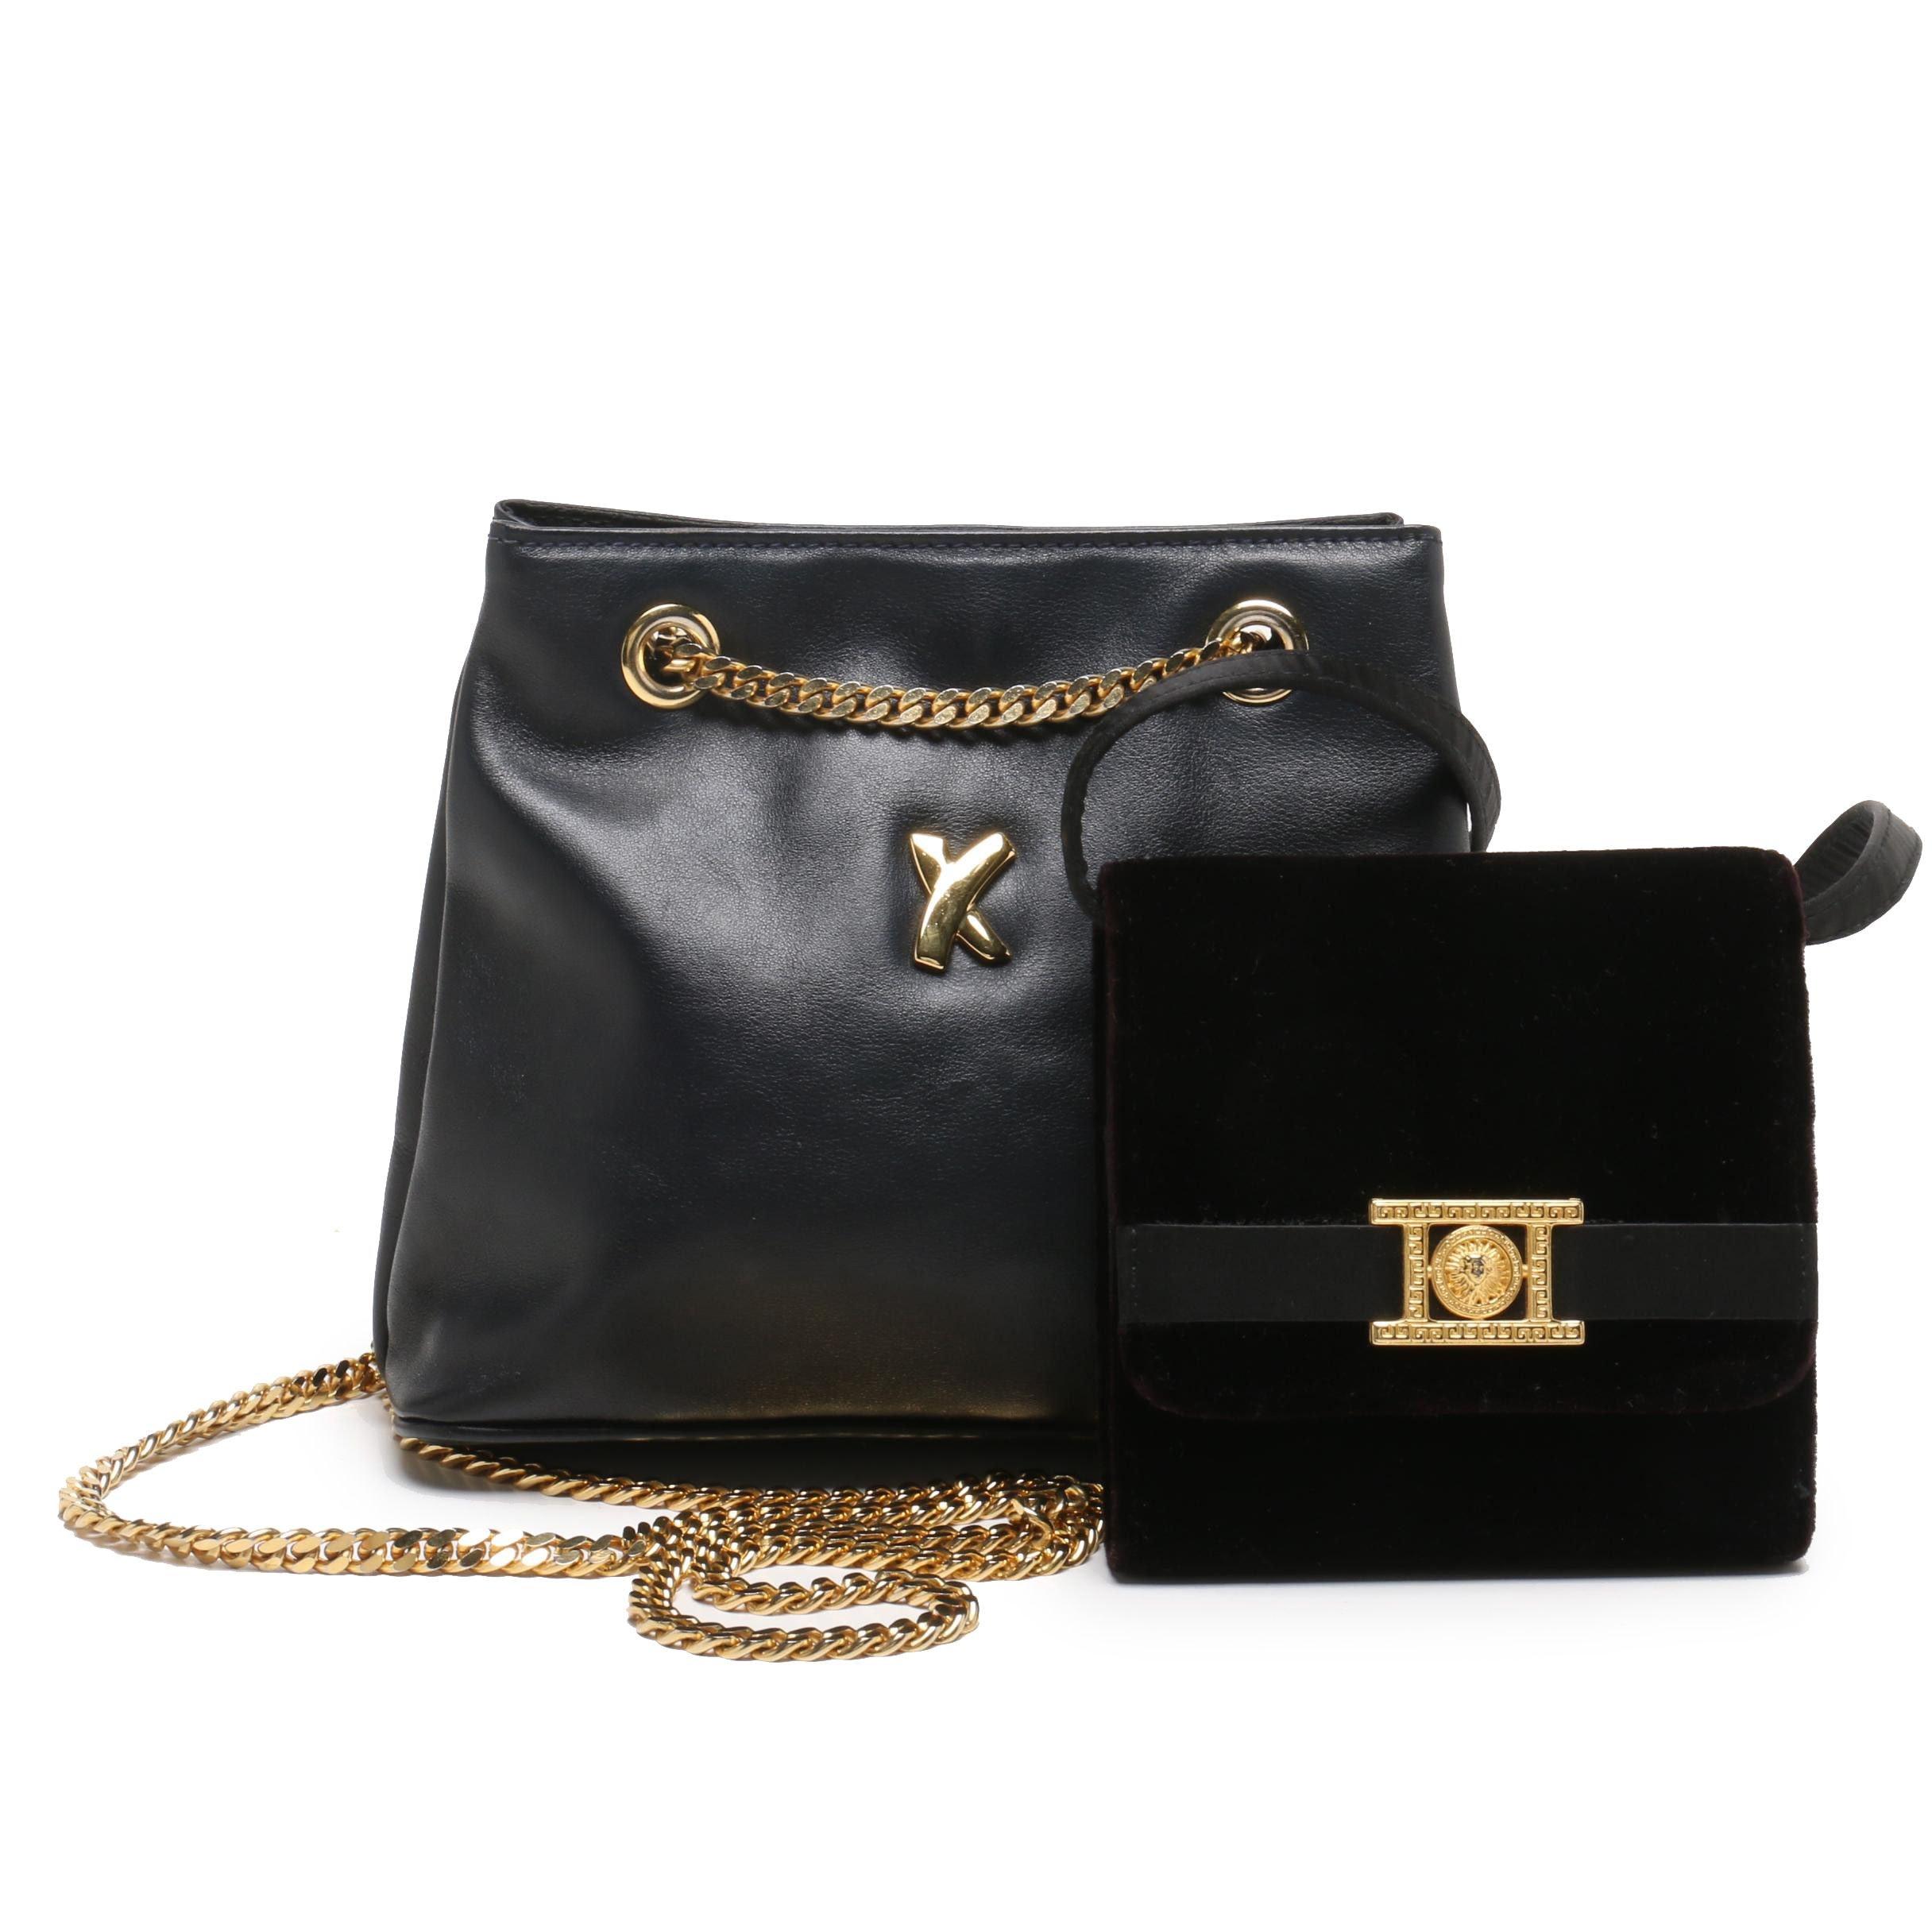 Paloma Picasso Navy Blue Leather Shoulder Bag and Milor Velveteen Crossbody Bag